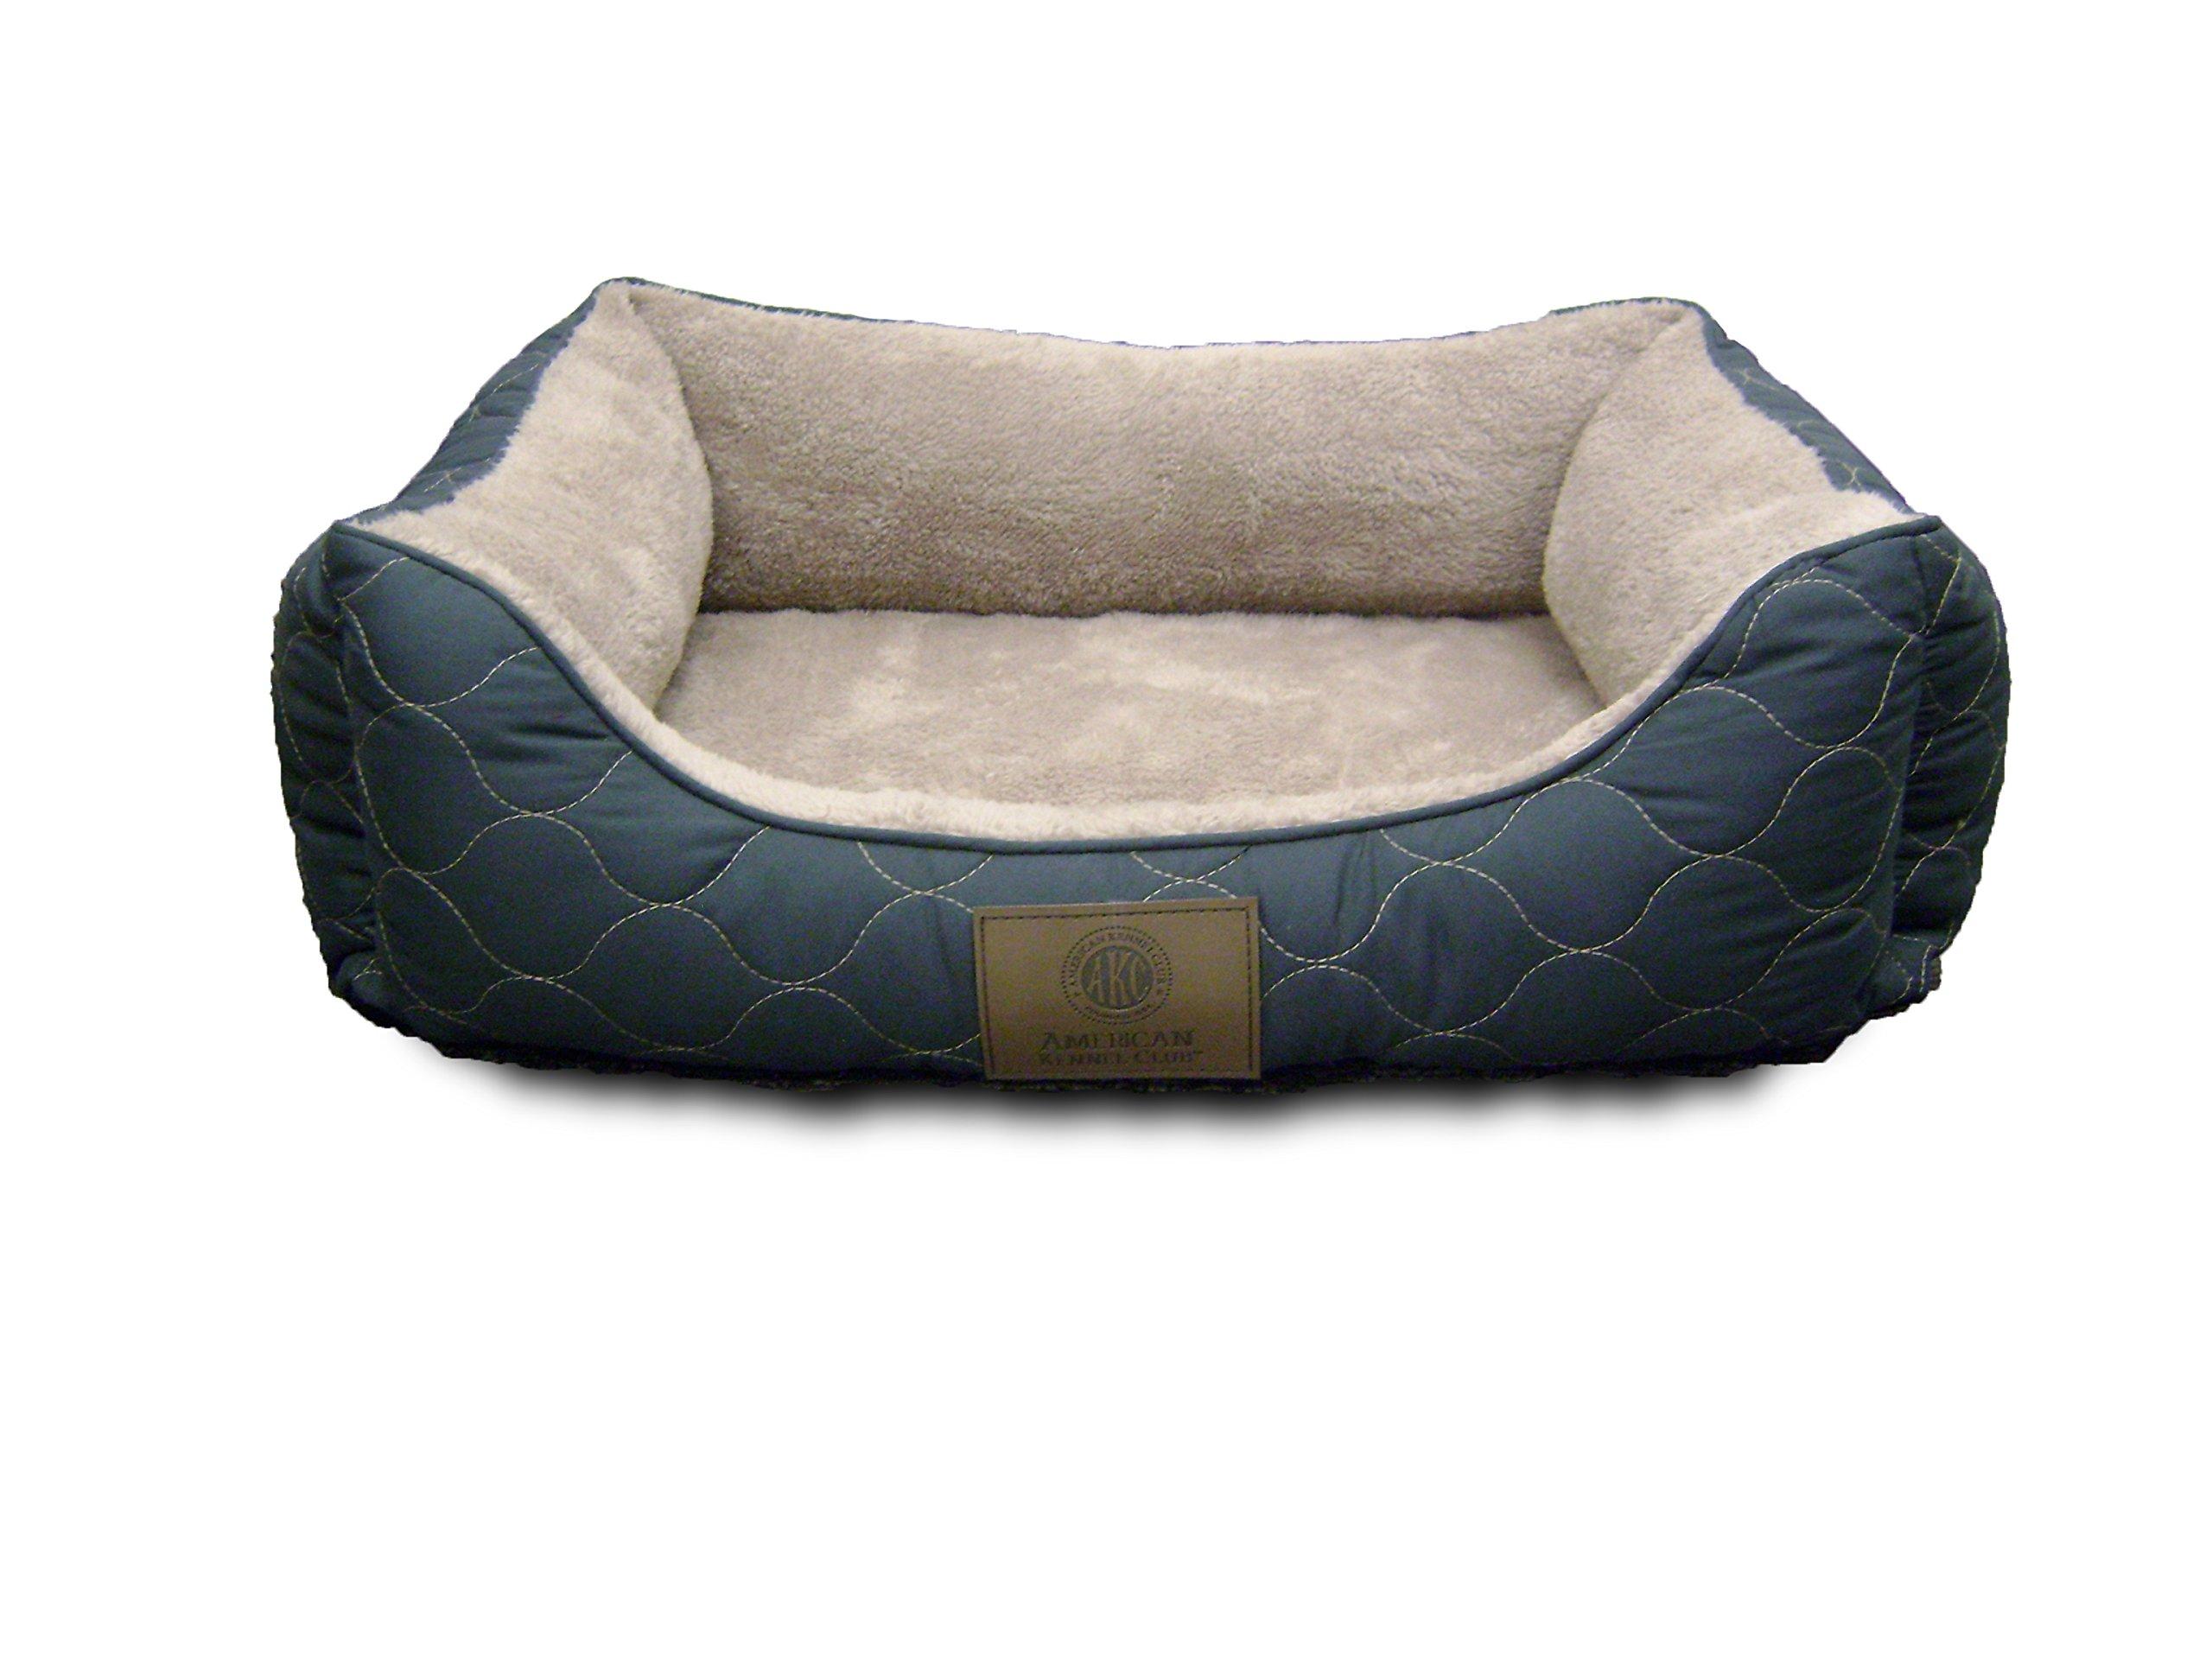 American Kennel Club Orthopedic Circle Stitch Cuddler Pet Bed, Gray